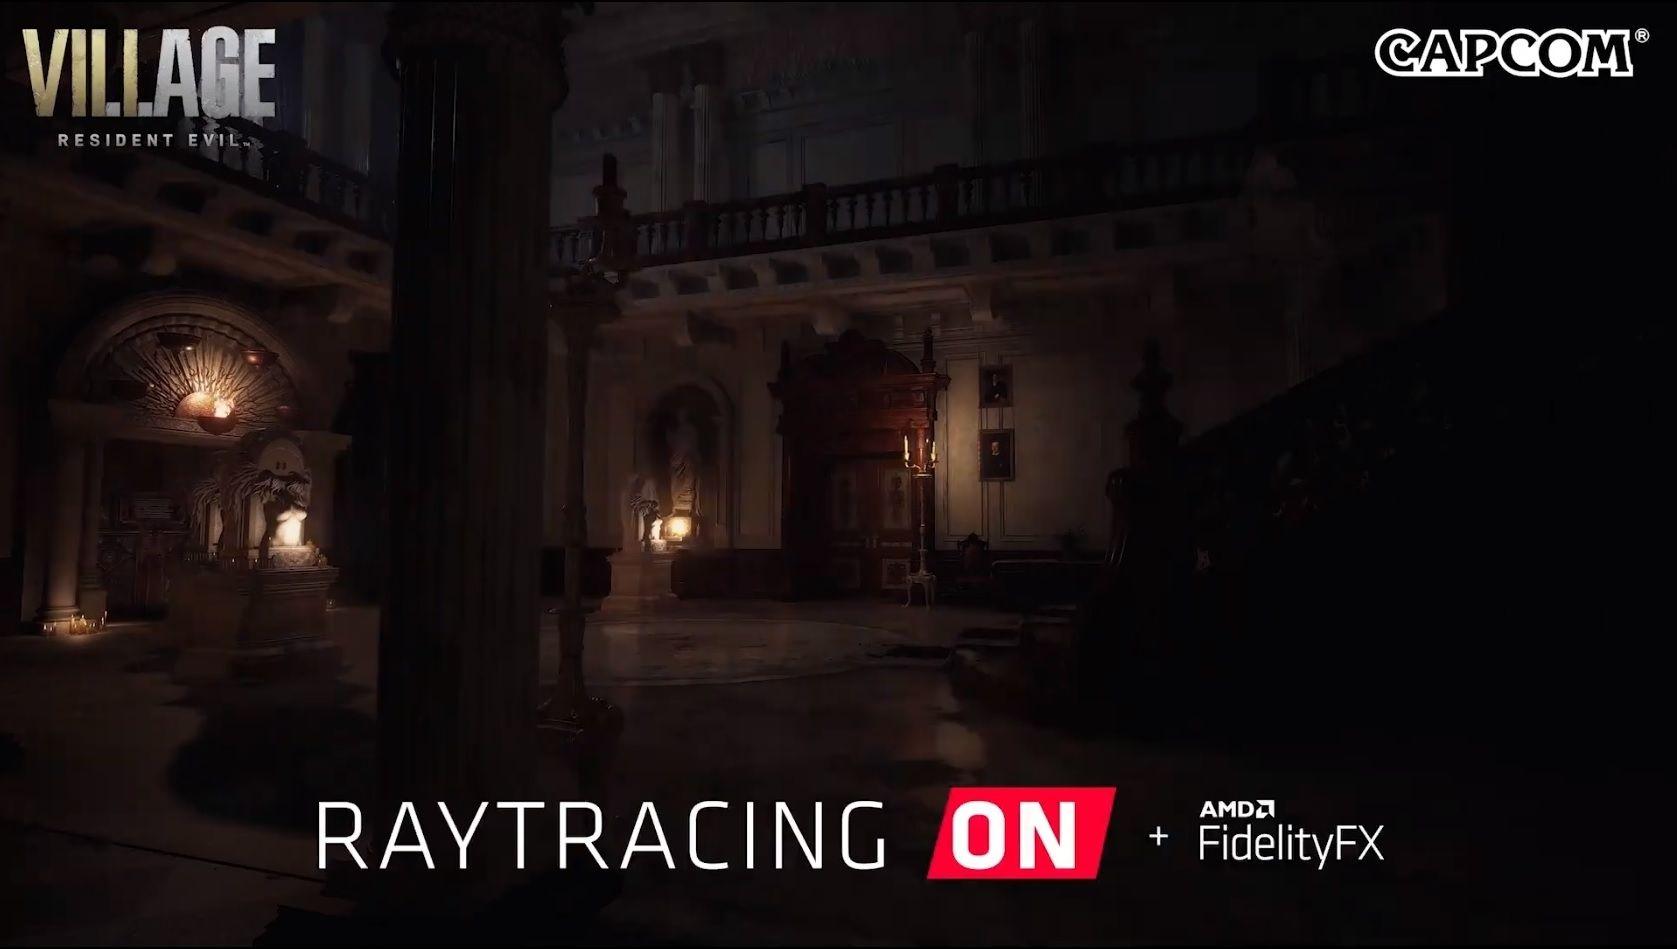 AMD Radeon RX 6700 XT raytracing